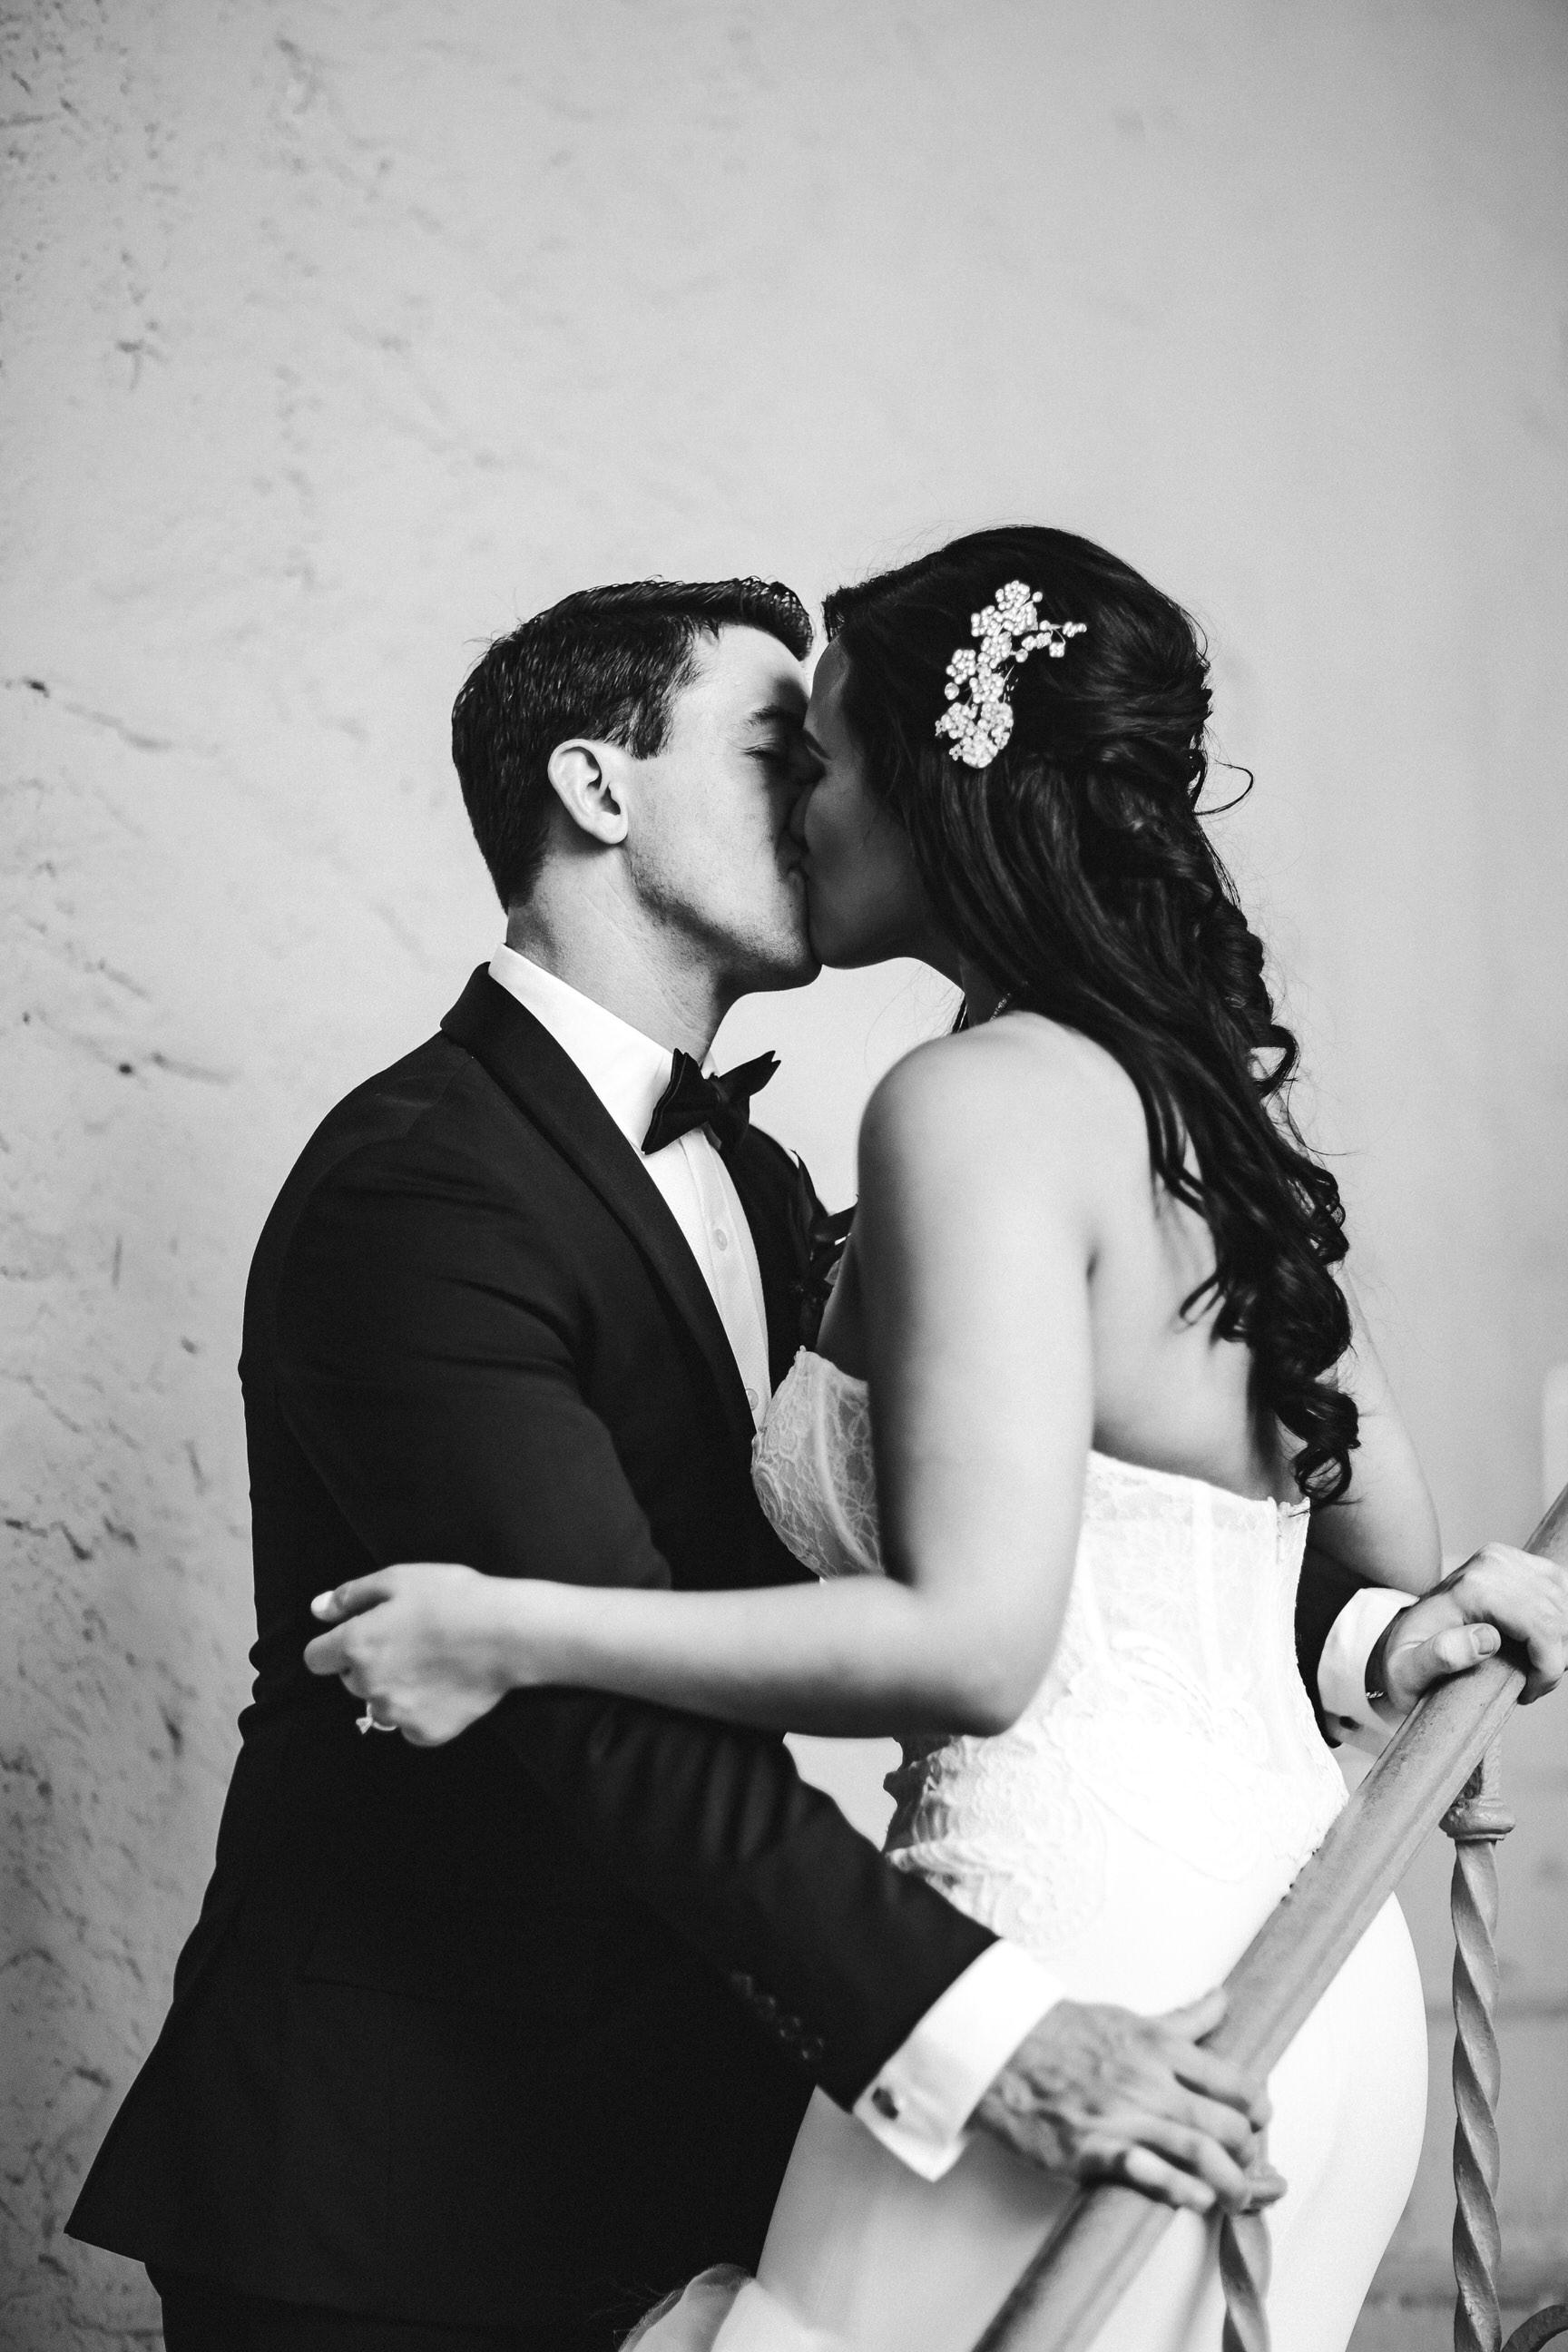 biltmore-wedding-steph-lynn-photo-photographer-bride-and-groom-19.jpg